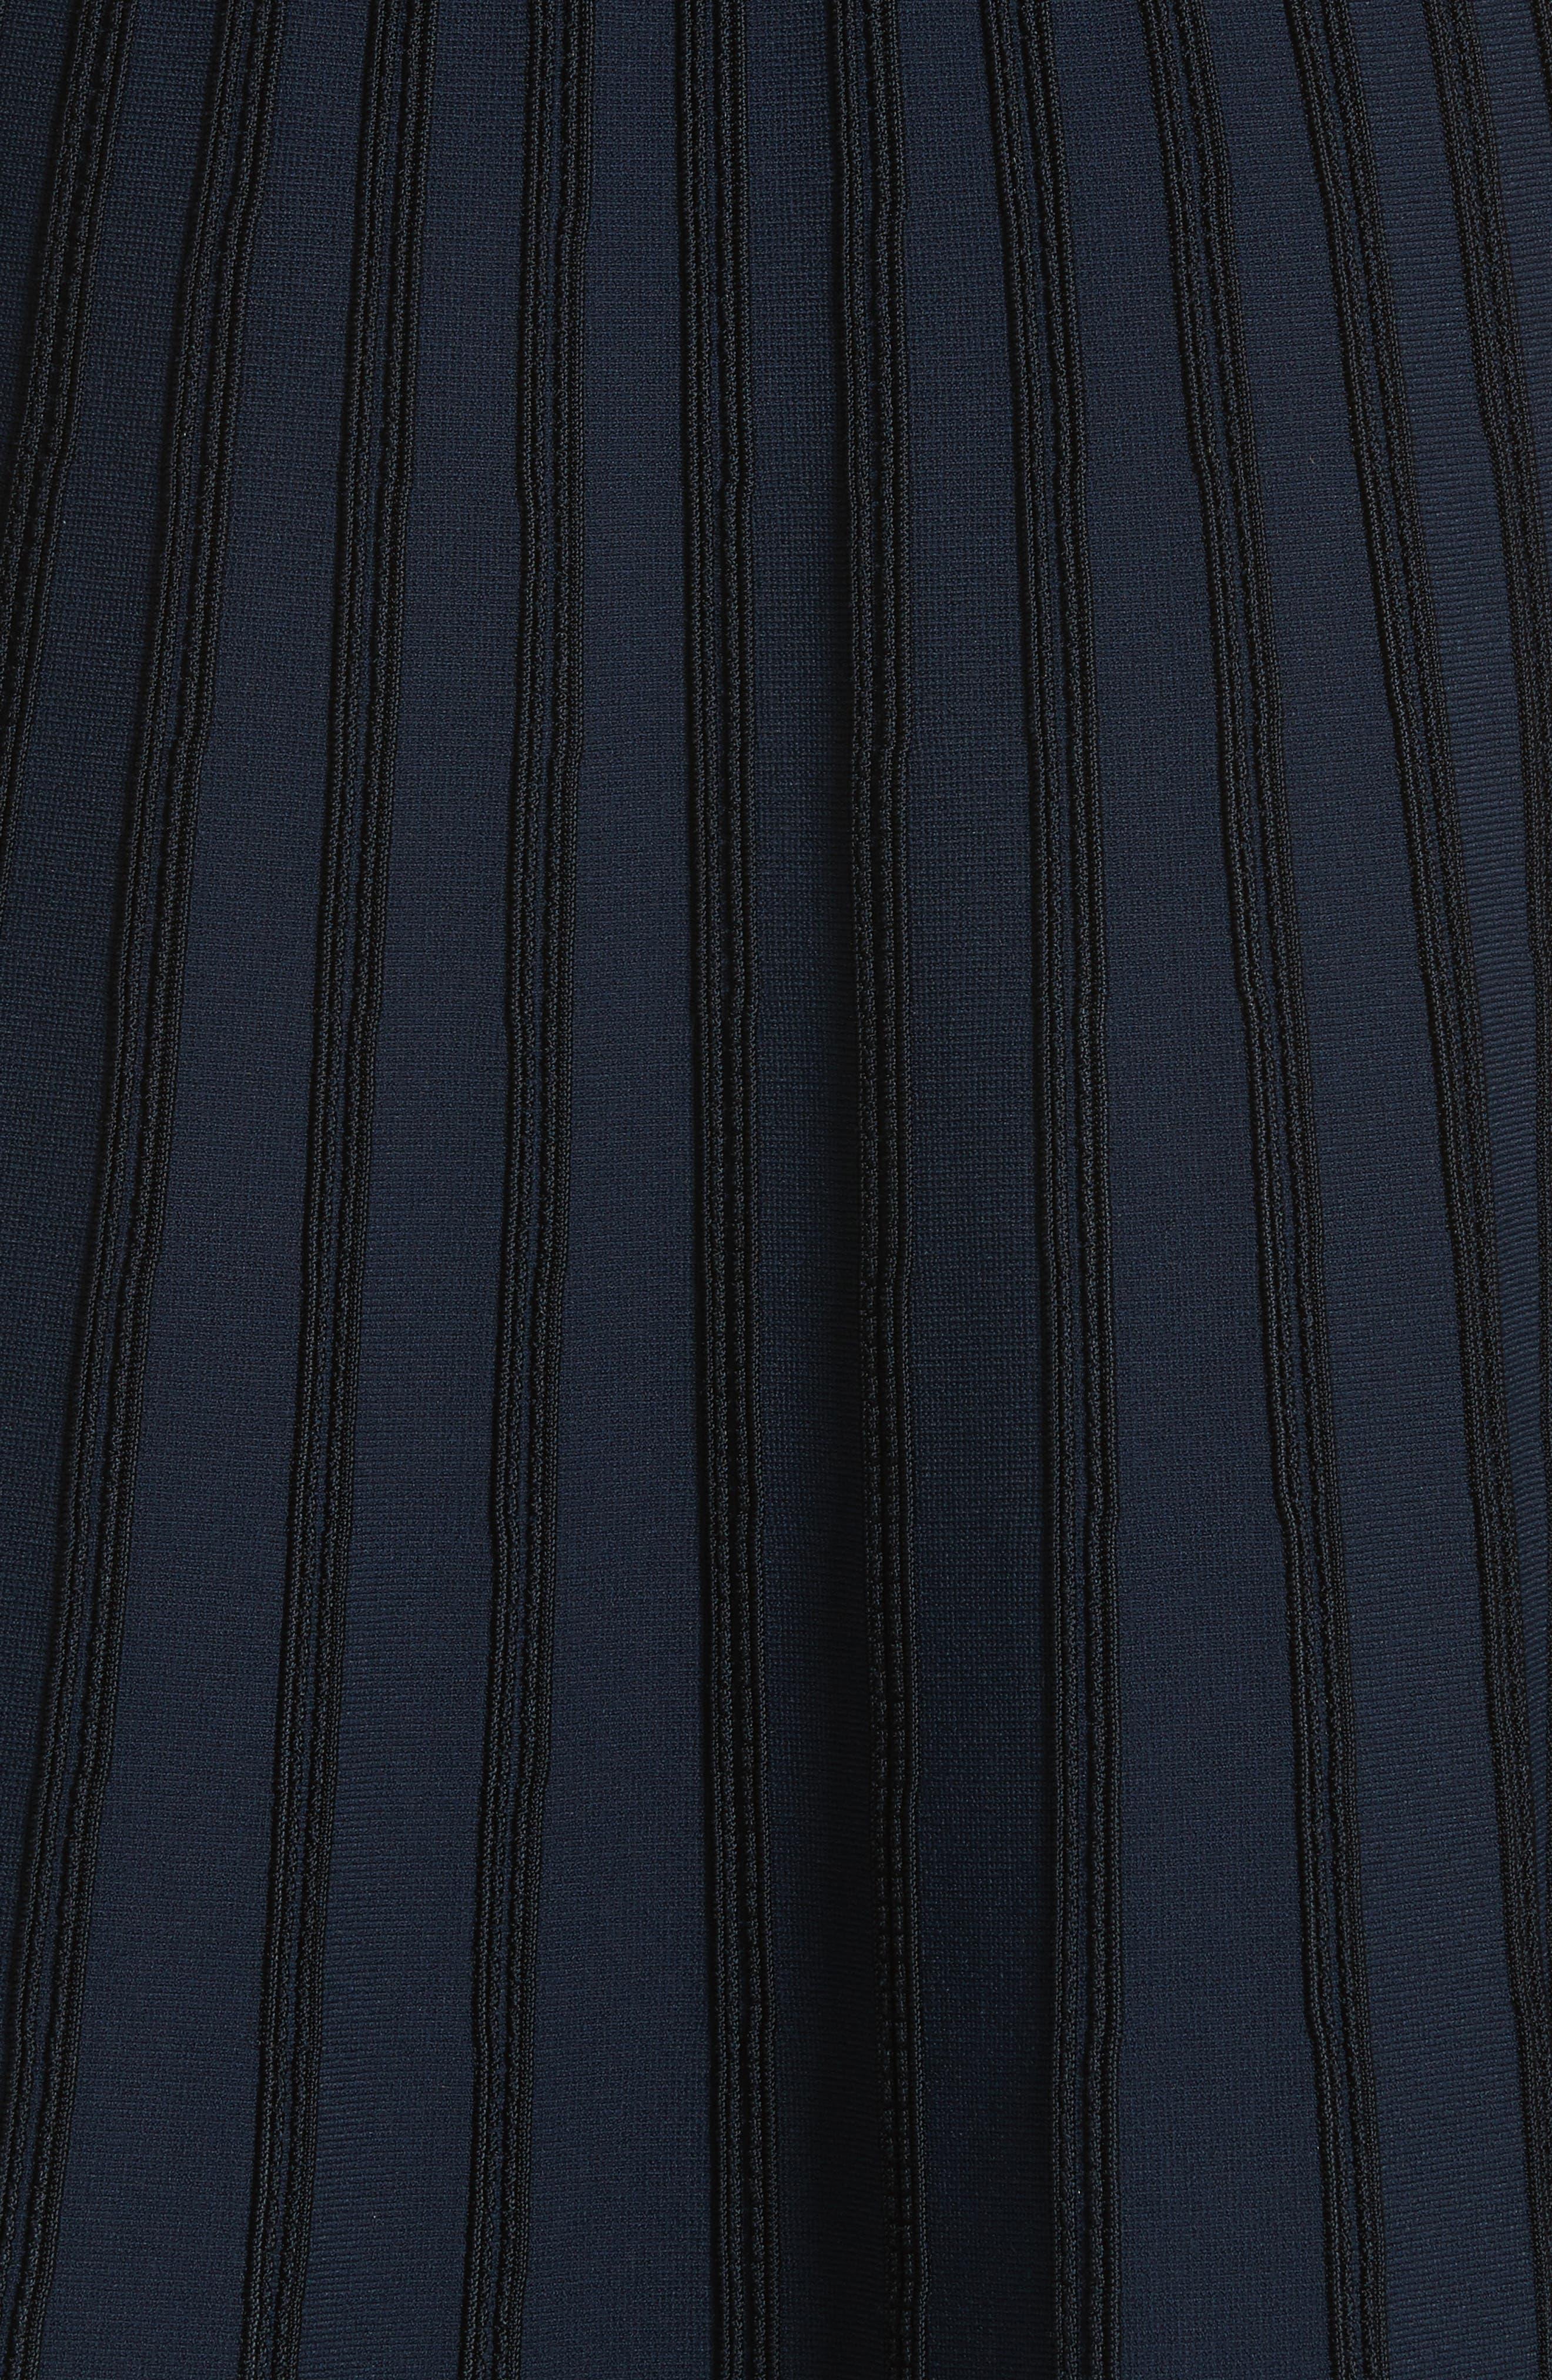 Scallop Trim Stripe Dress,                             Alternate thumbnail 5, color,                             410